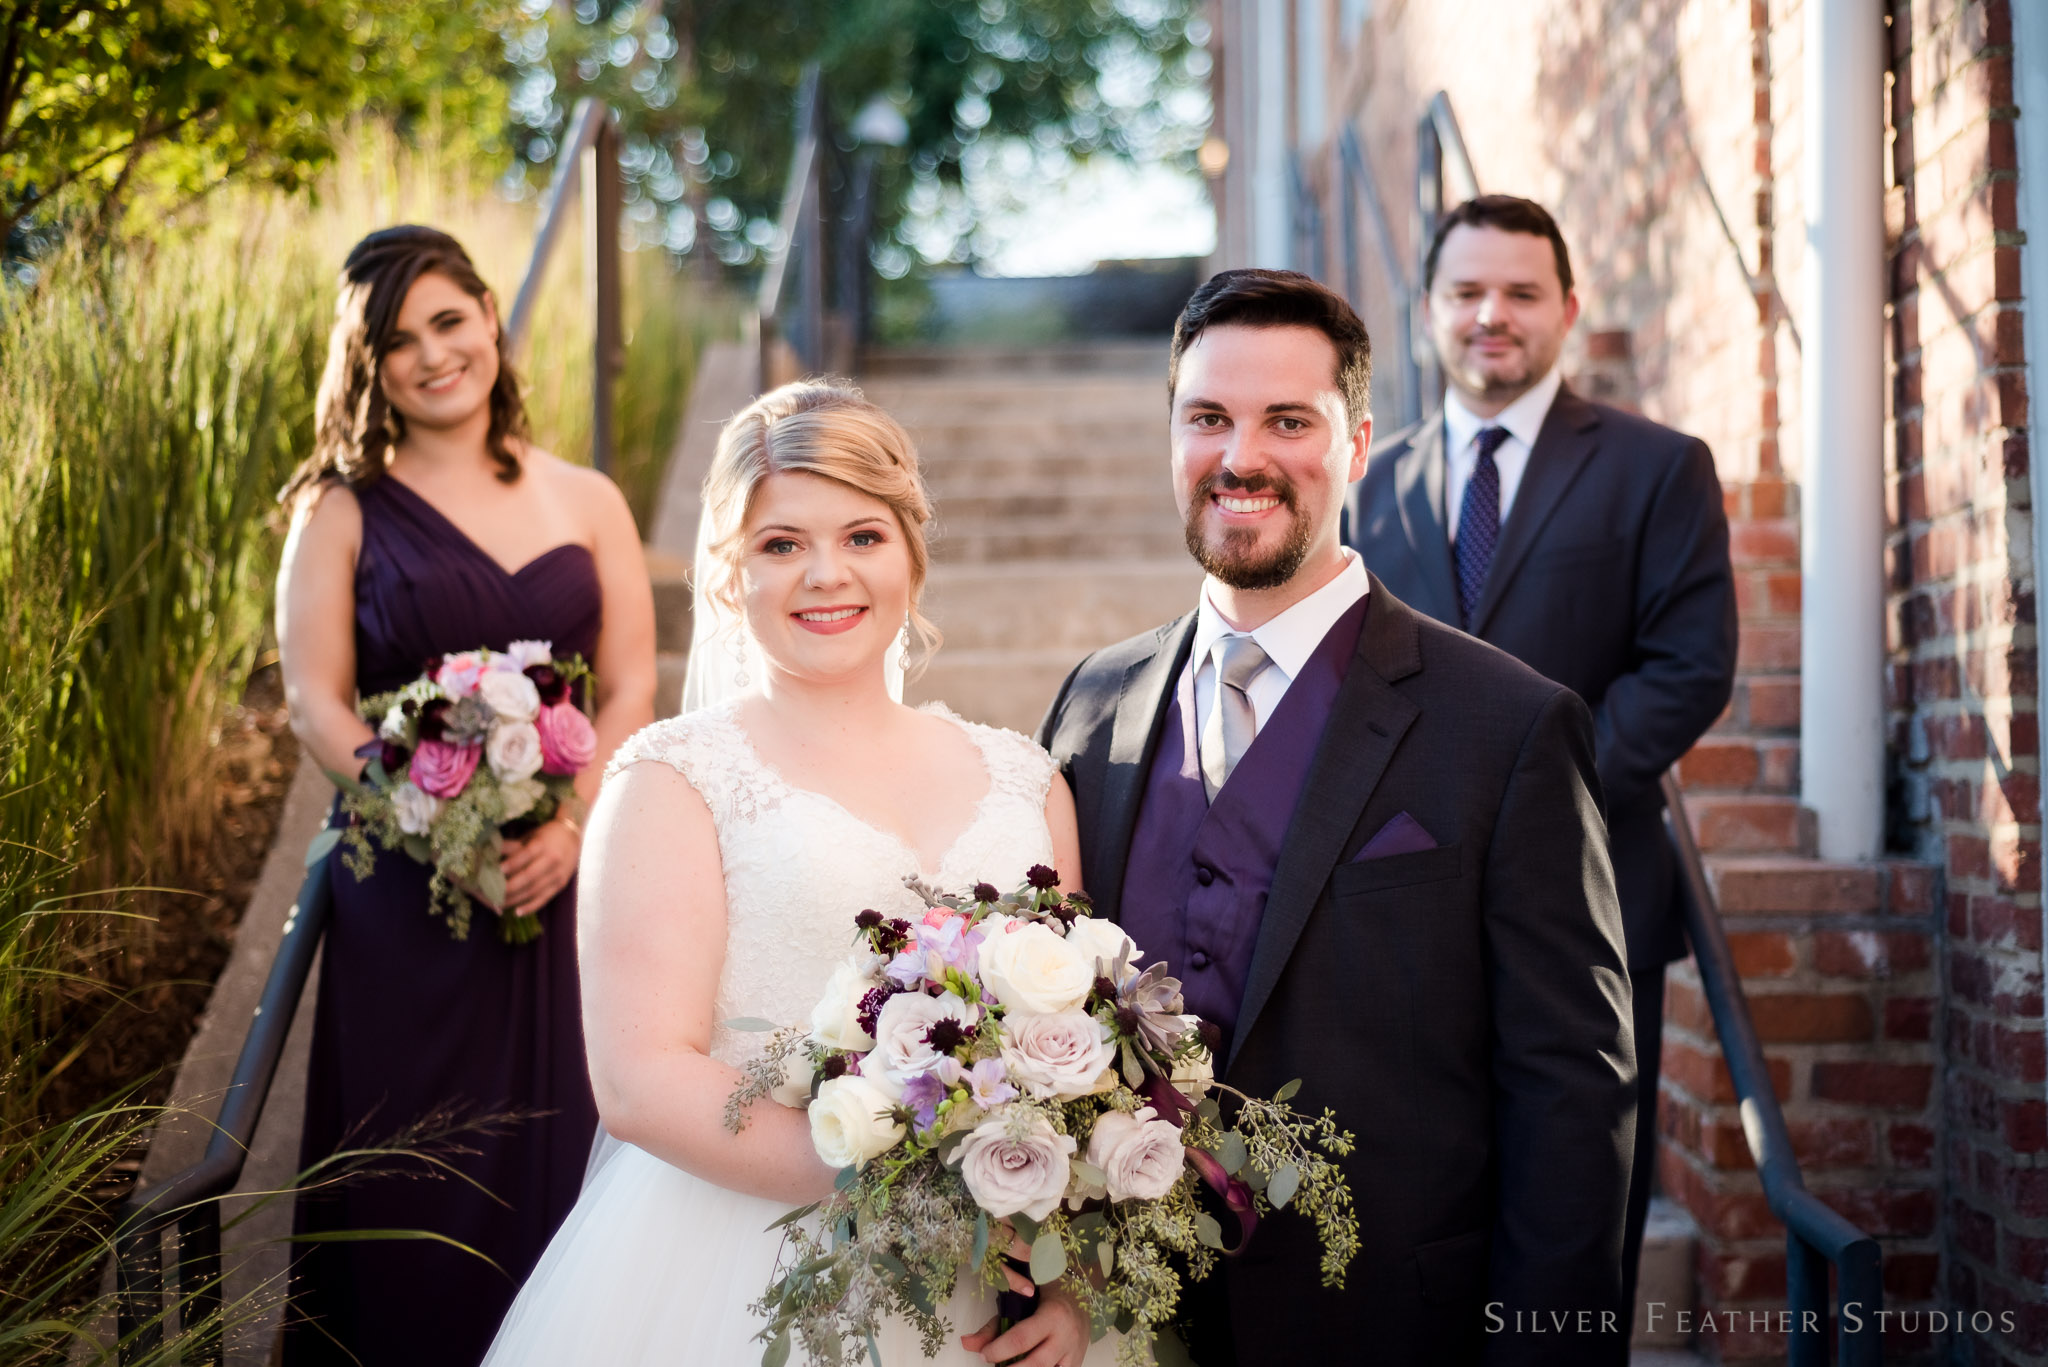 cottom-room-wedding-photography-016.jpg